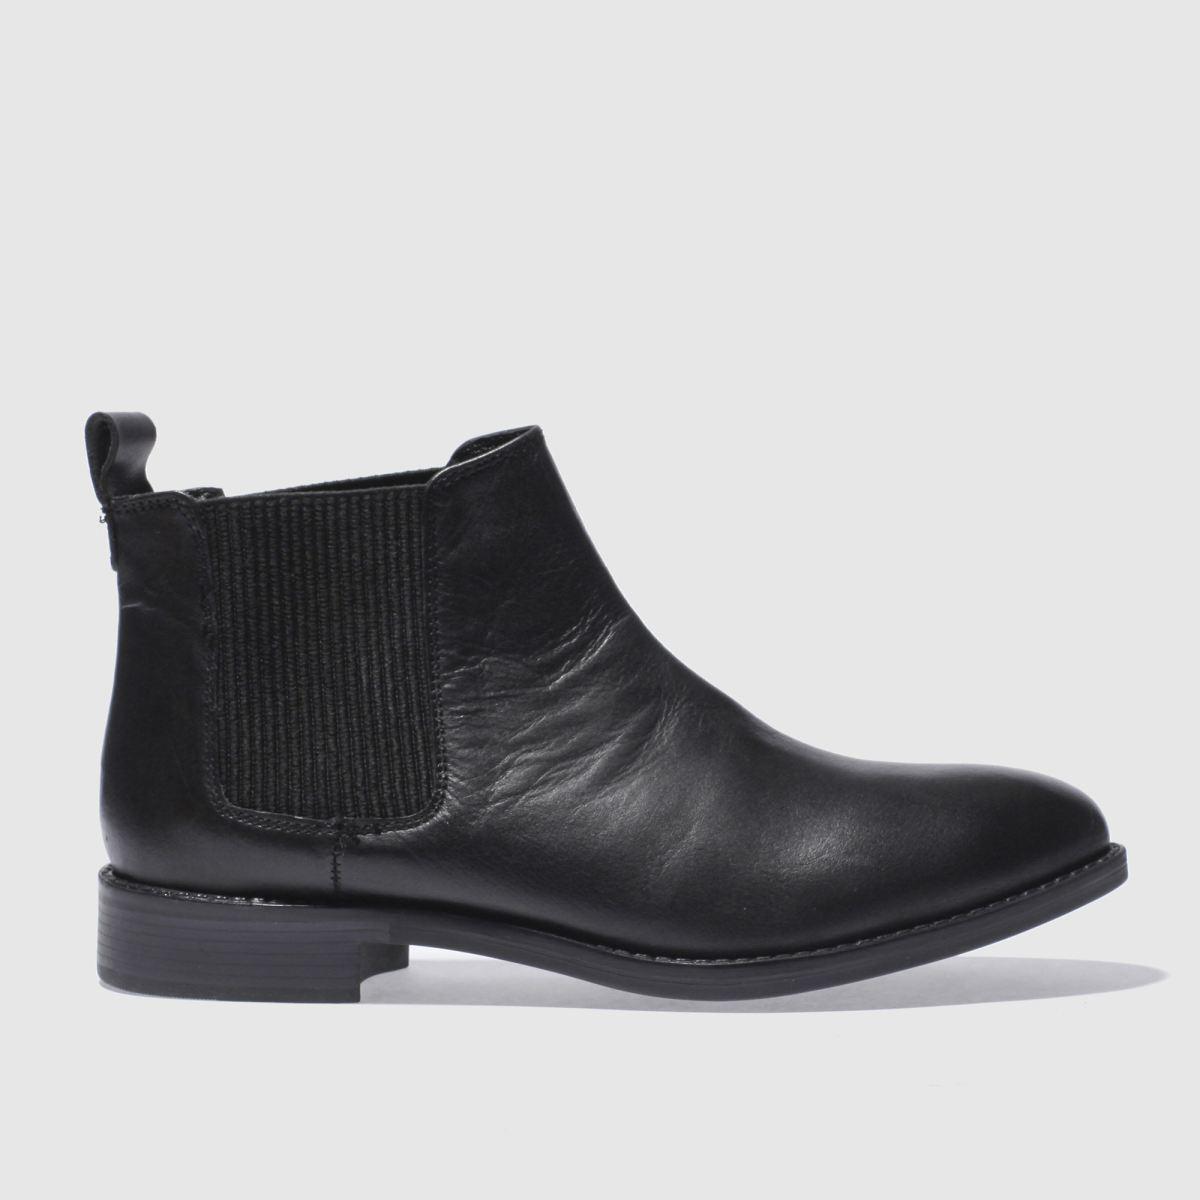 schuh ugg joey boots